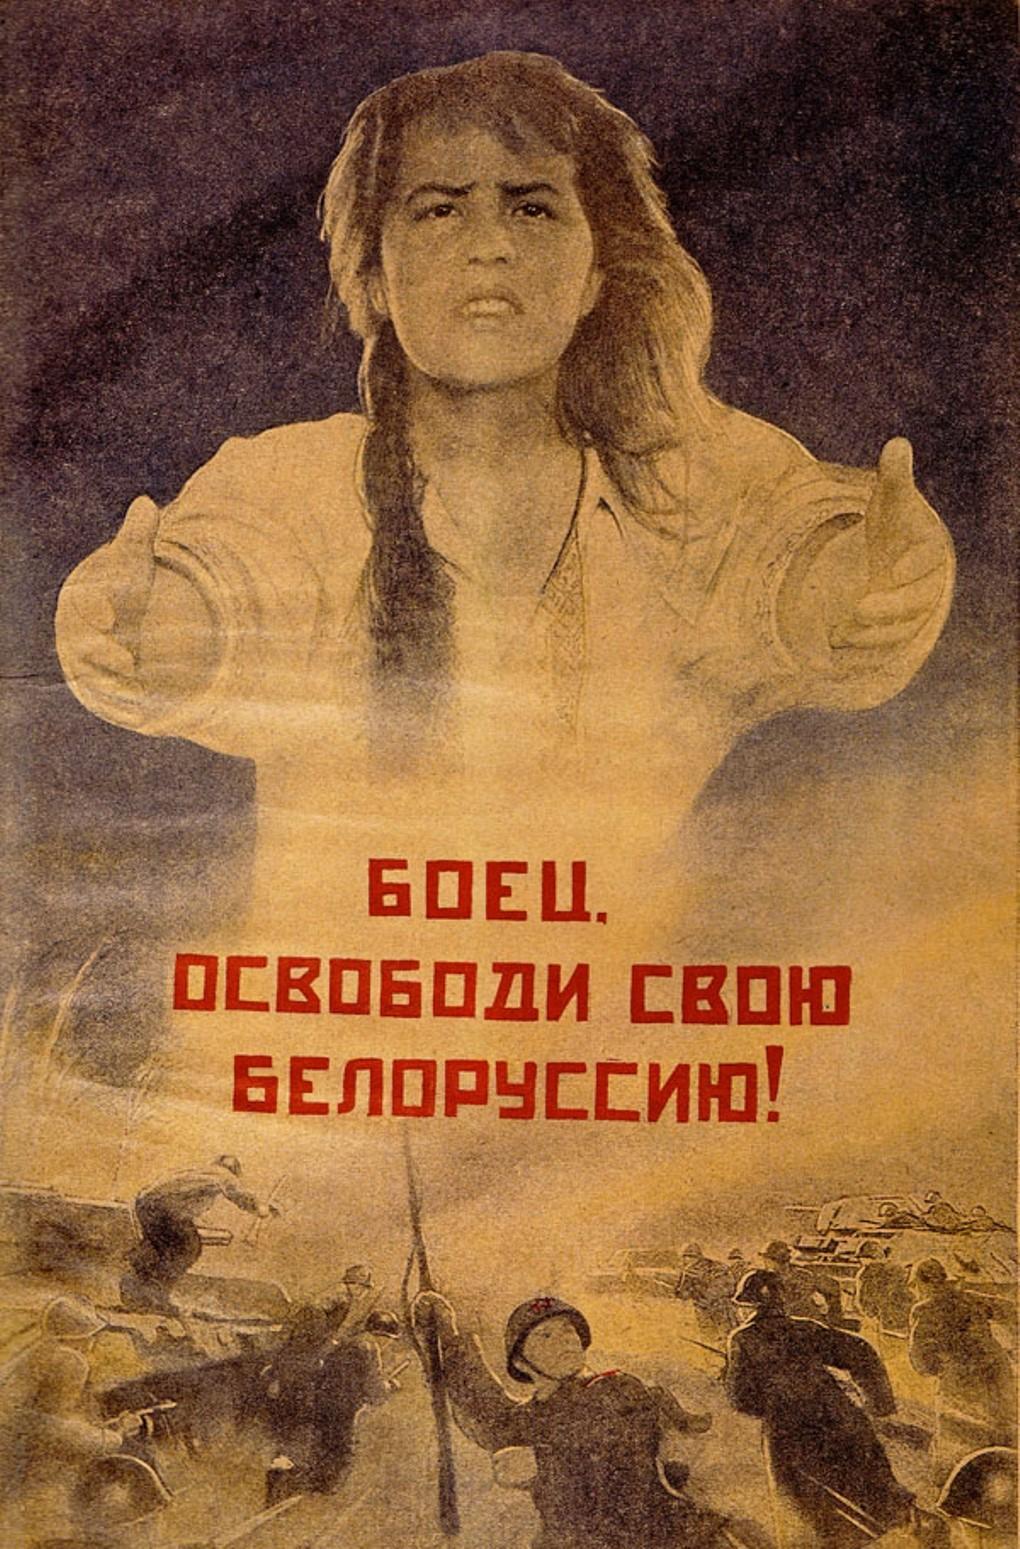 Боец. Освободите свою Белоруссию! Виктор Корецкий, 1943